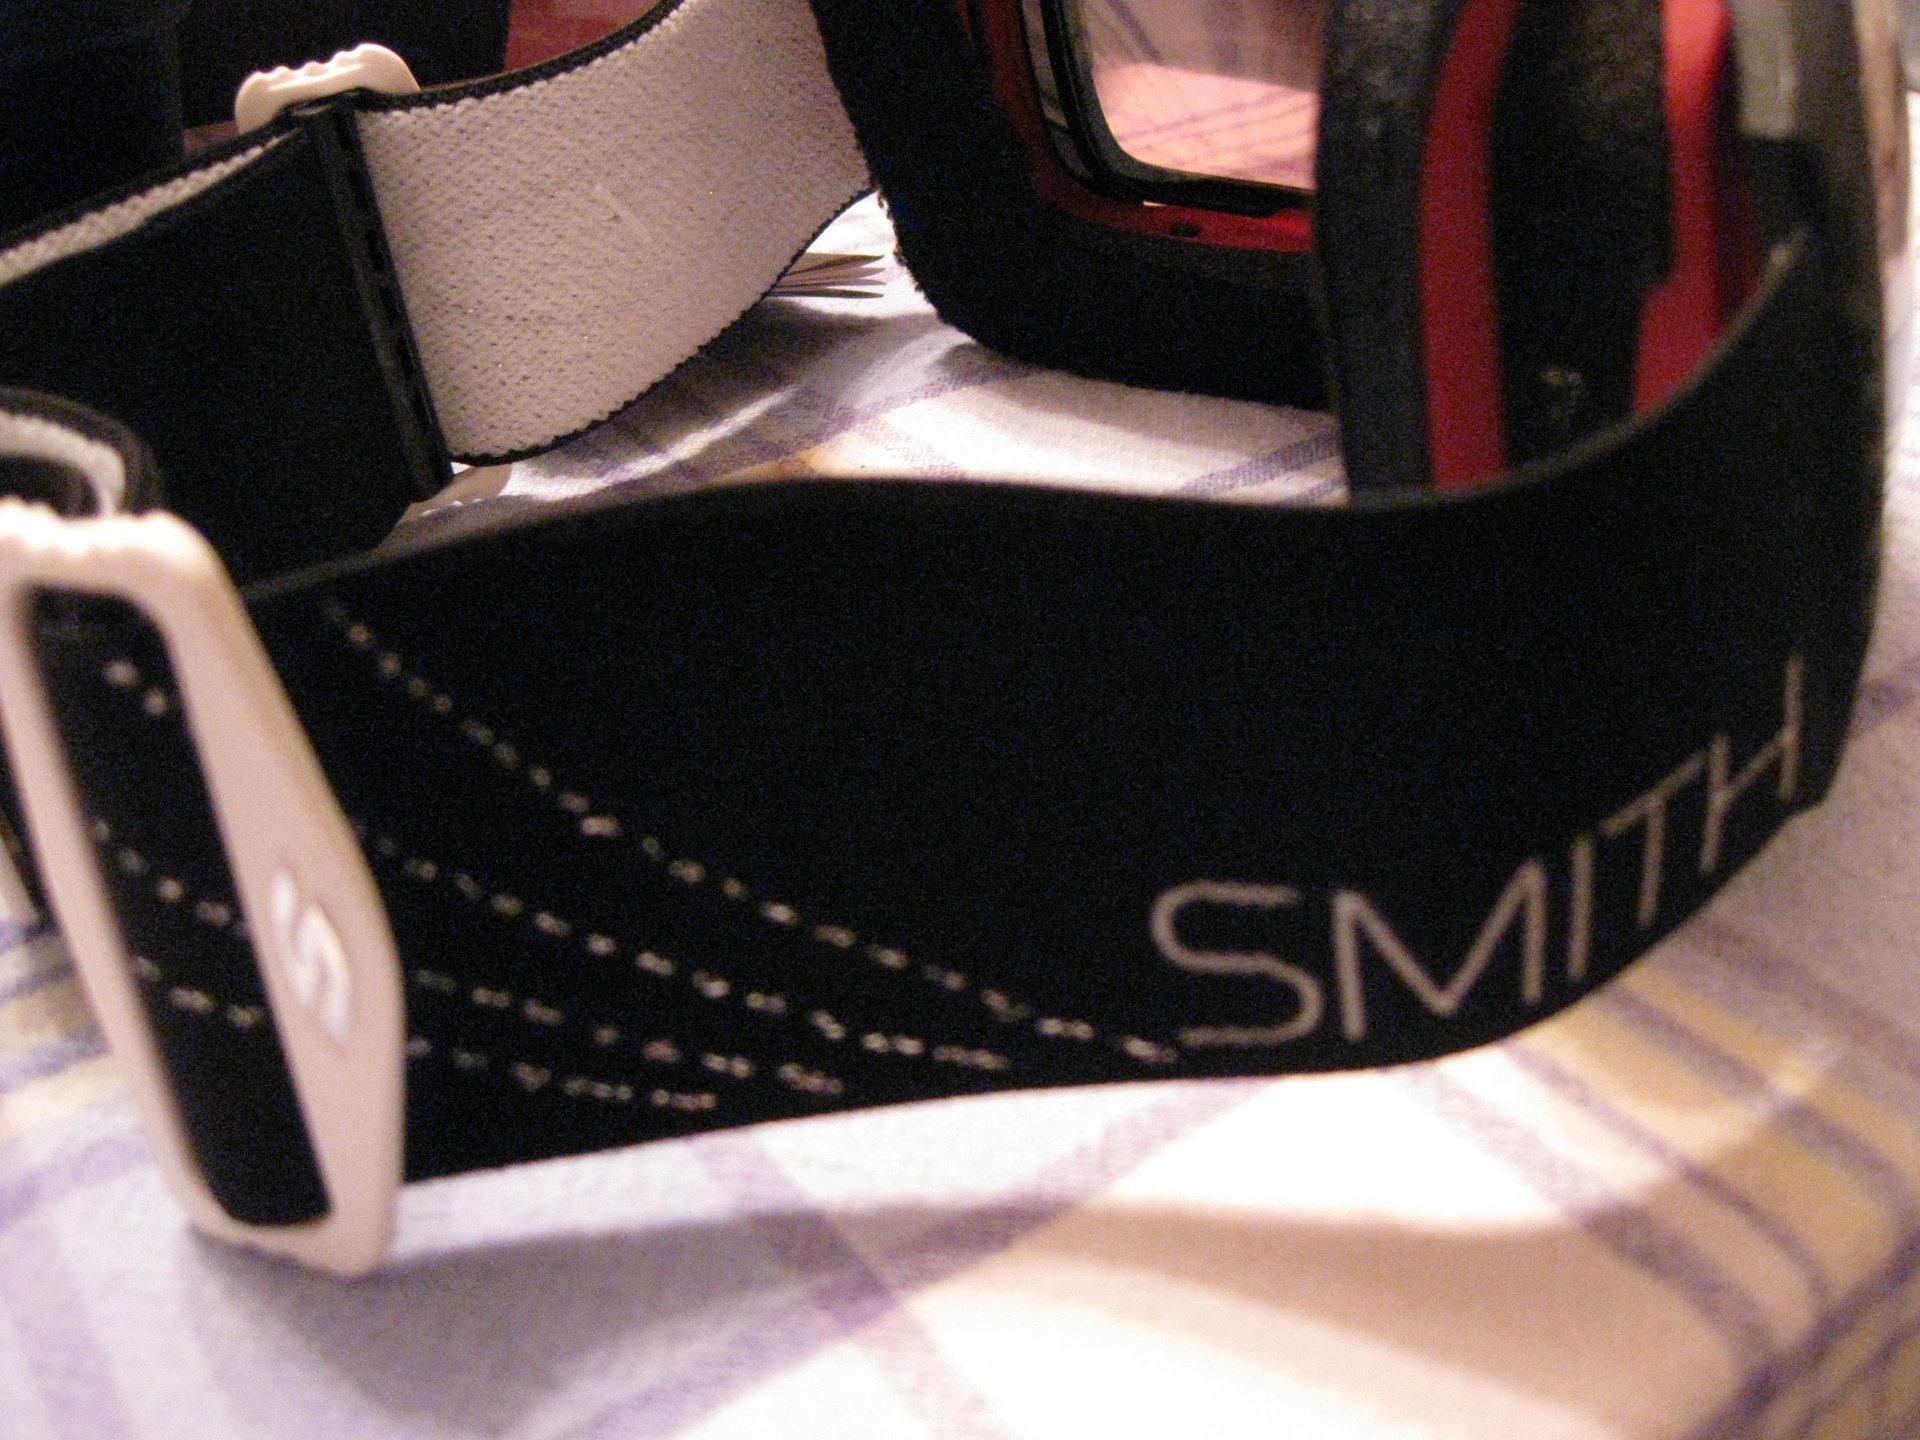 Smithiostrap4